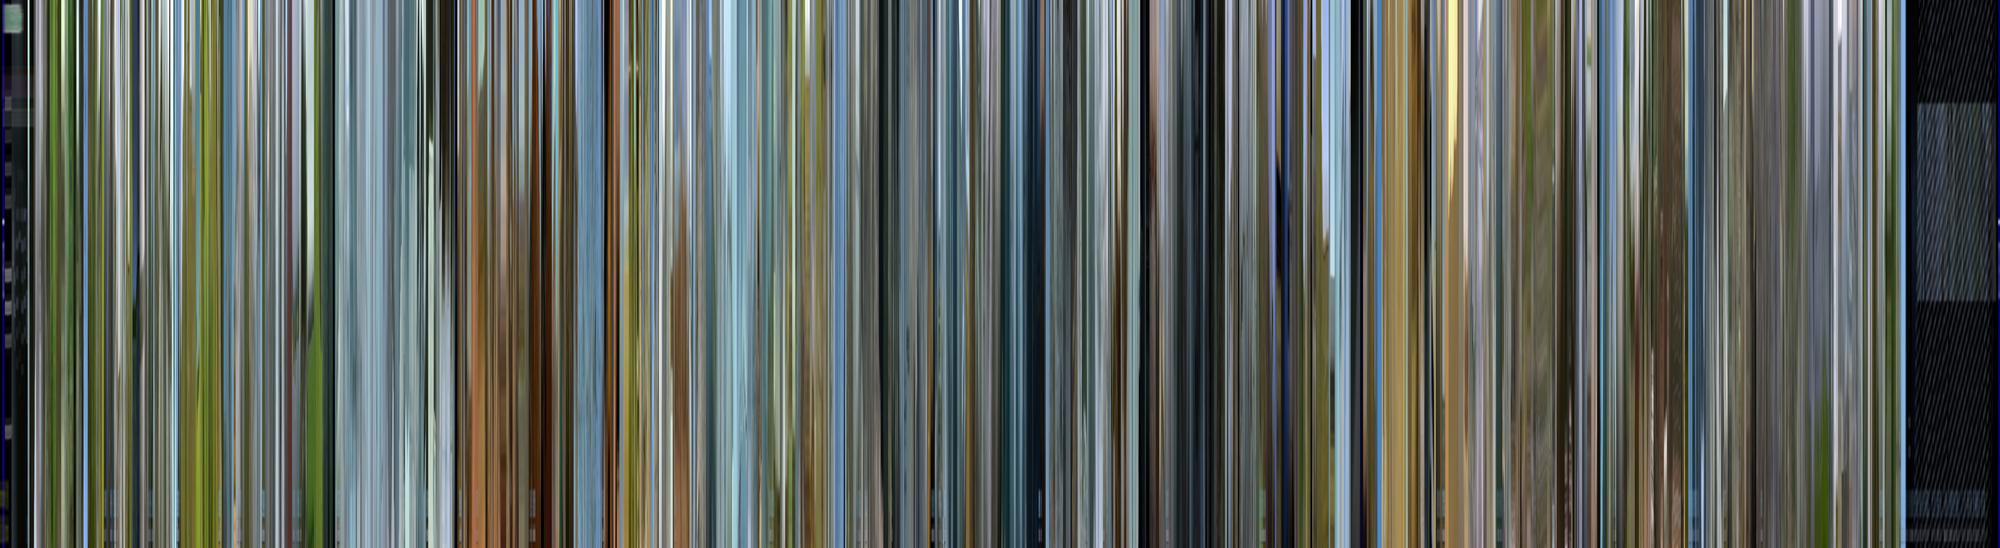 https://github.com/xiaohanyu/moviebarcode/raw/master/screenshots/winged_migration_moviebarcode.png